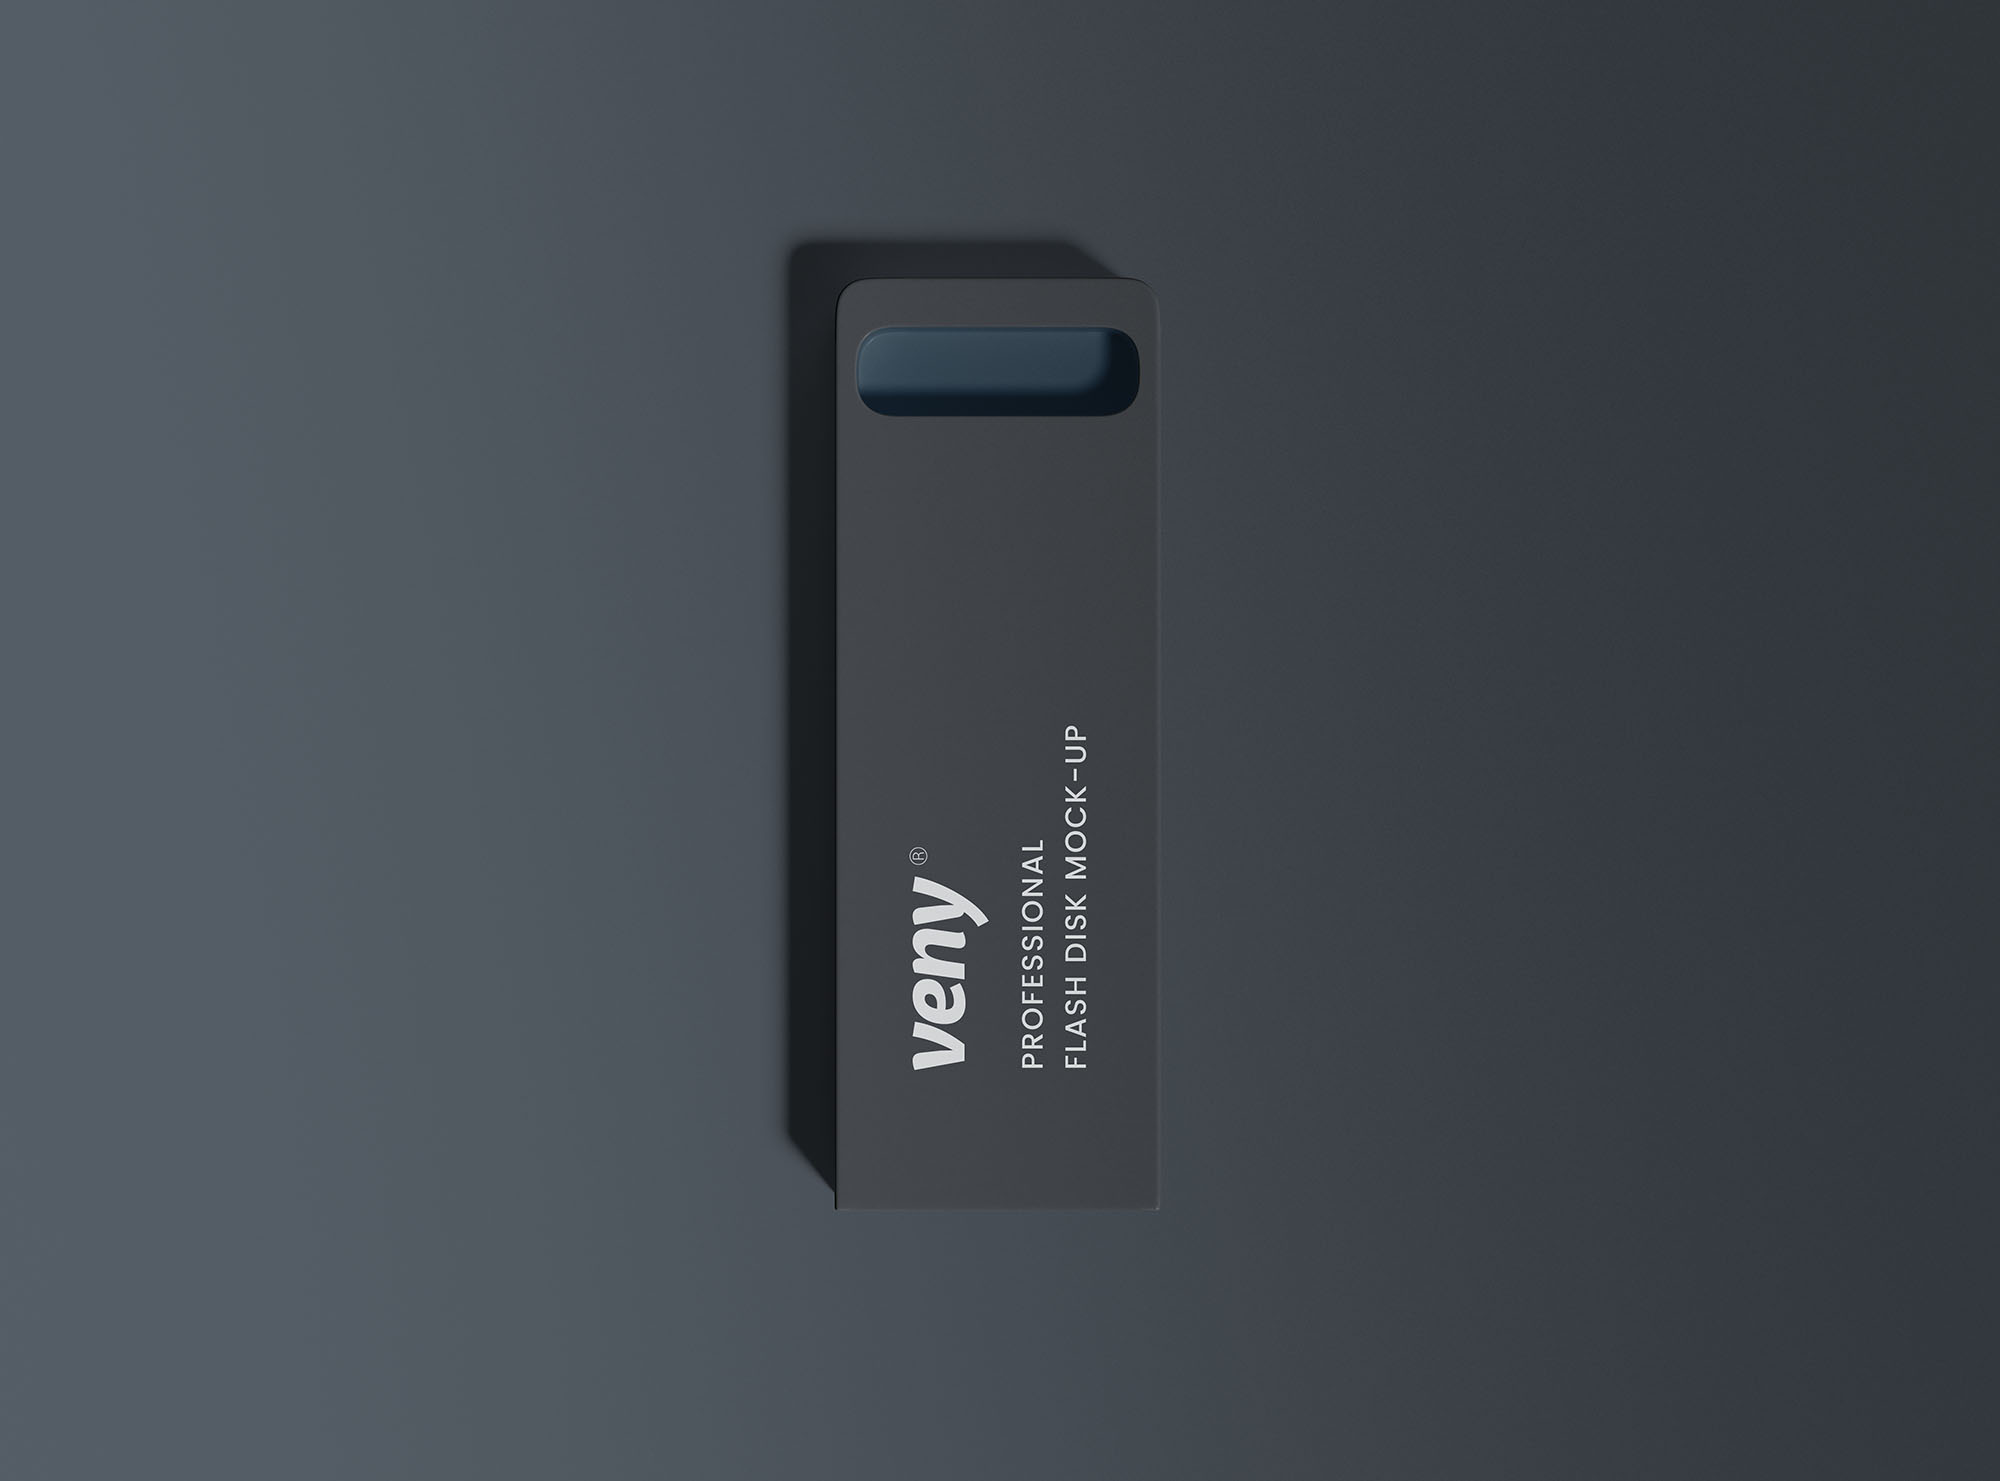 Free Flash Disk Mockup (PSD)